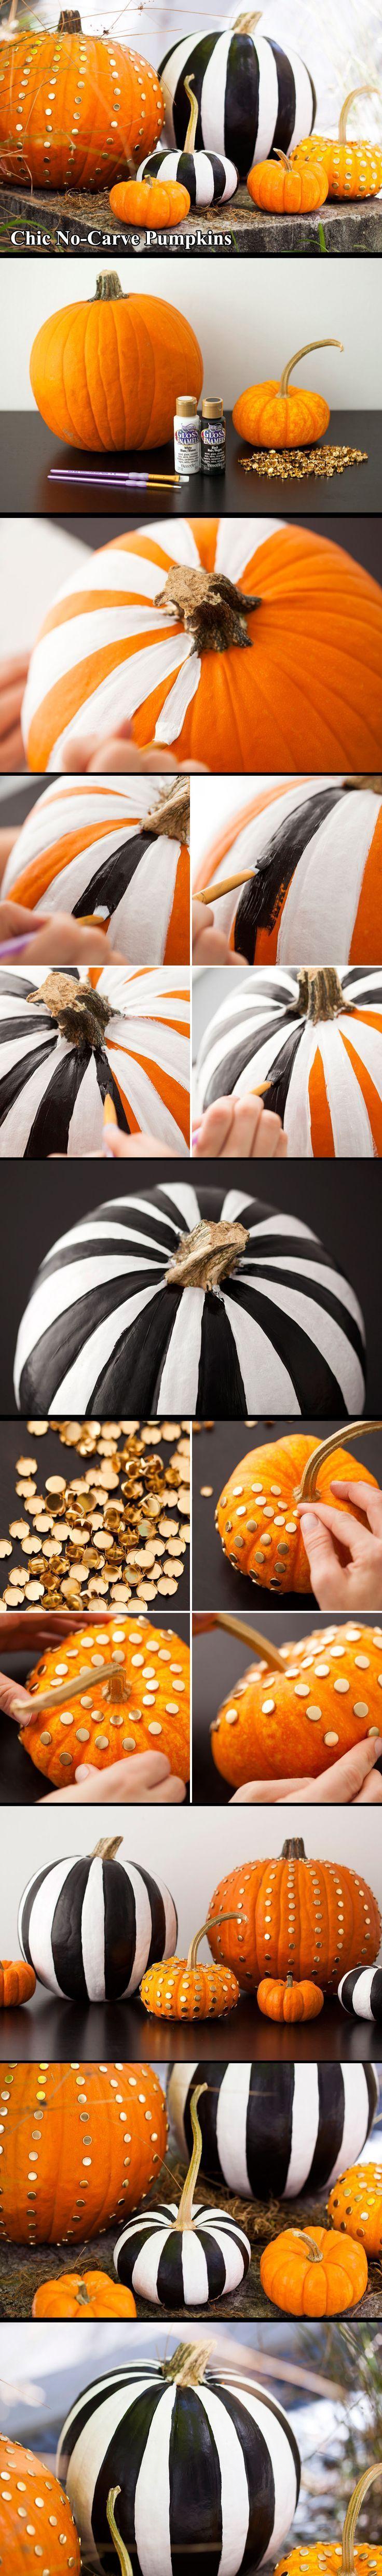 No Carve Pumpkin Decorating Ideas | Bubble station, Halloween ...